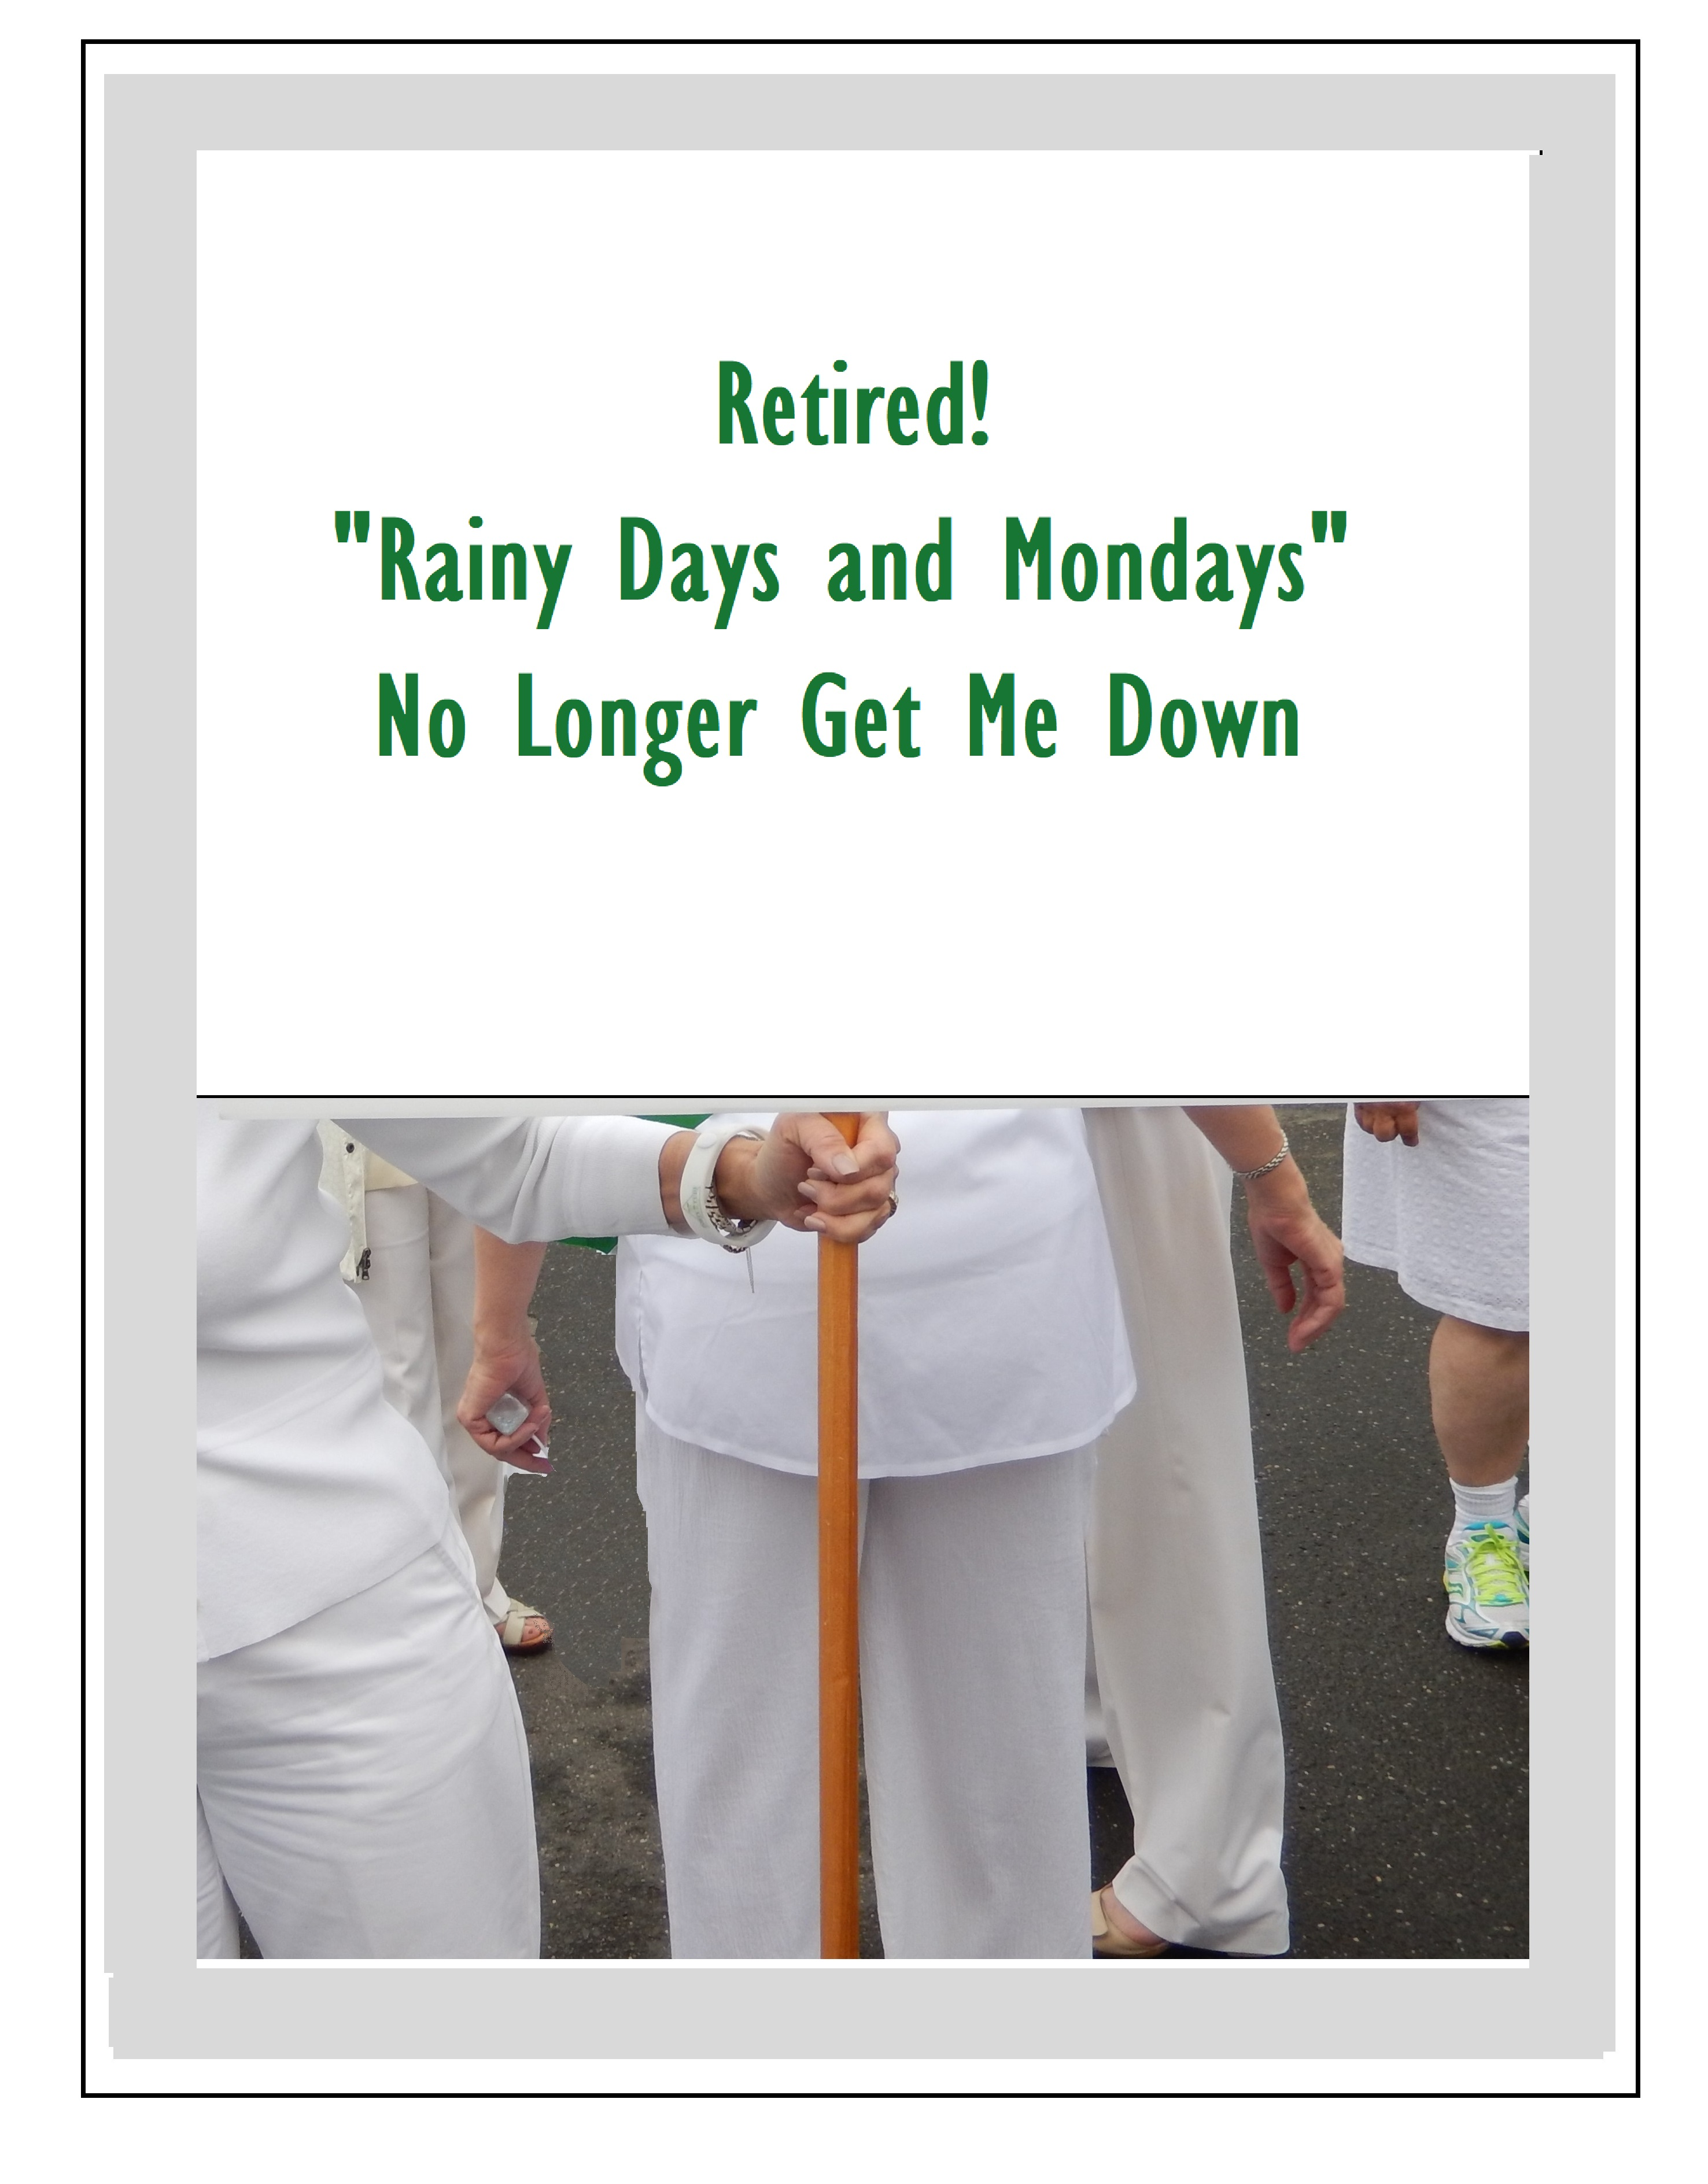 Rainy-Days-and-Mondays